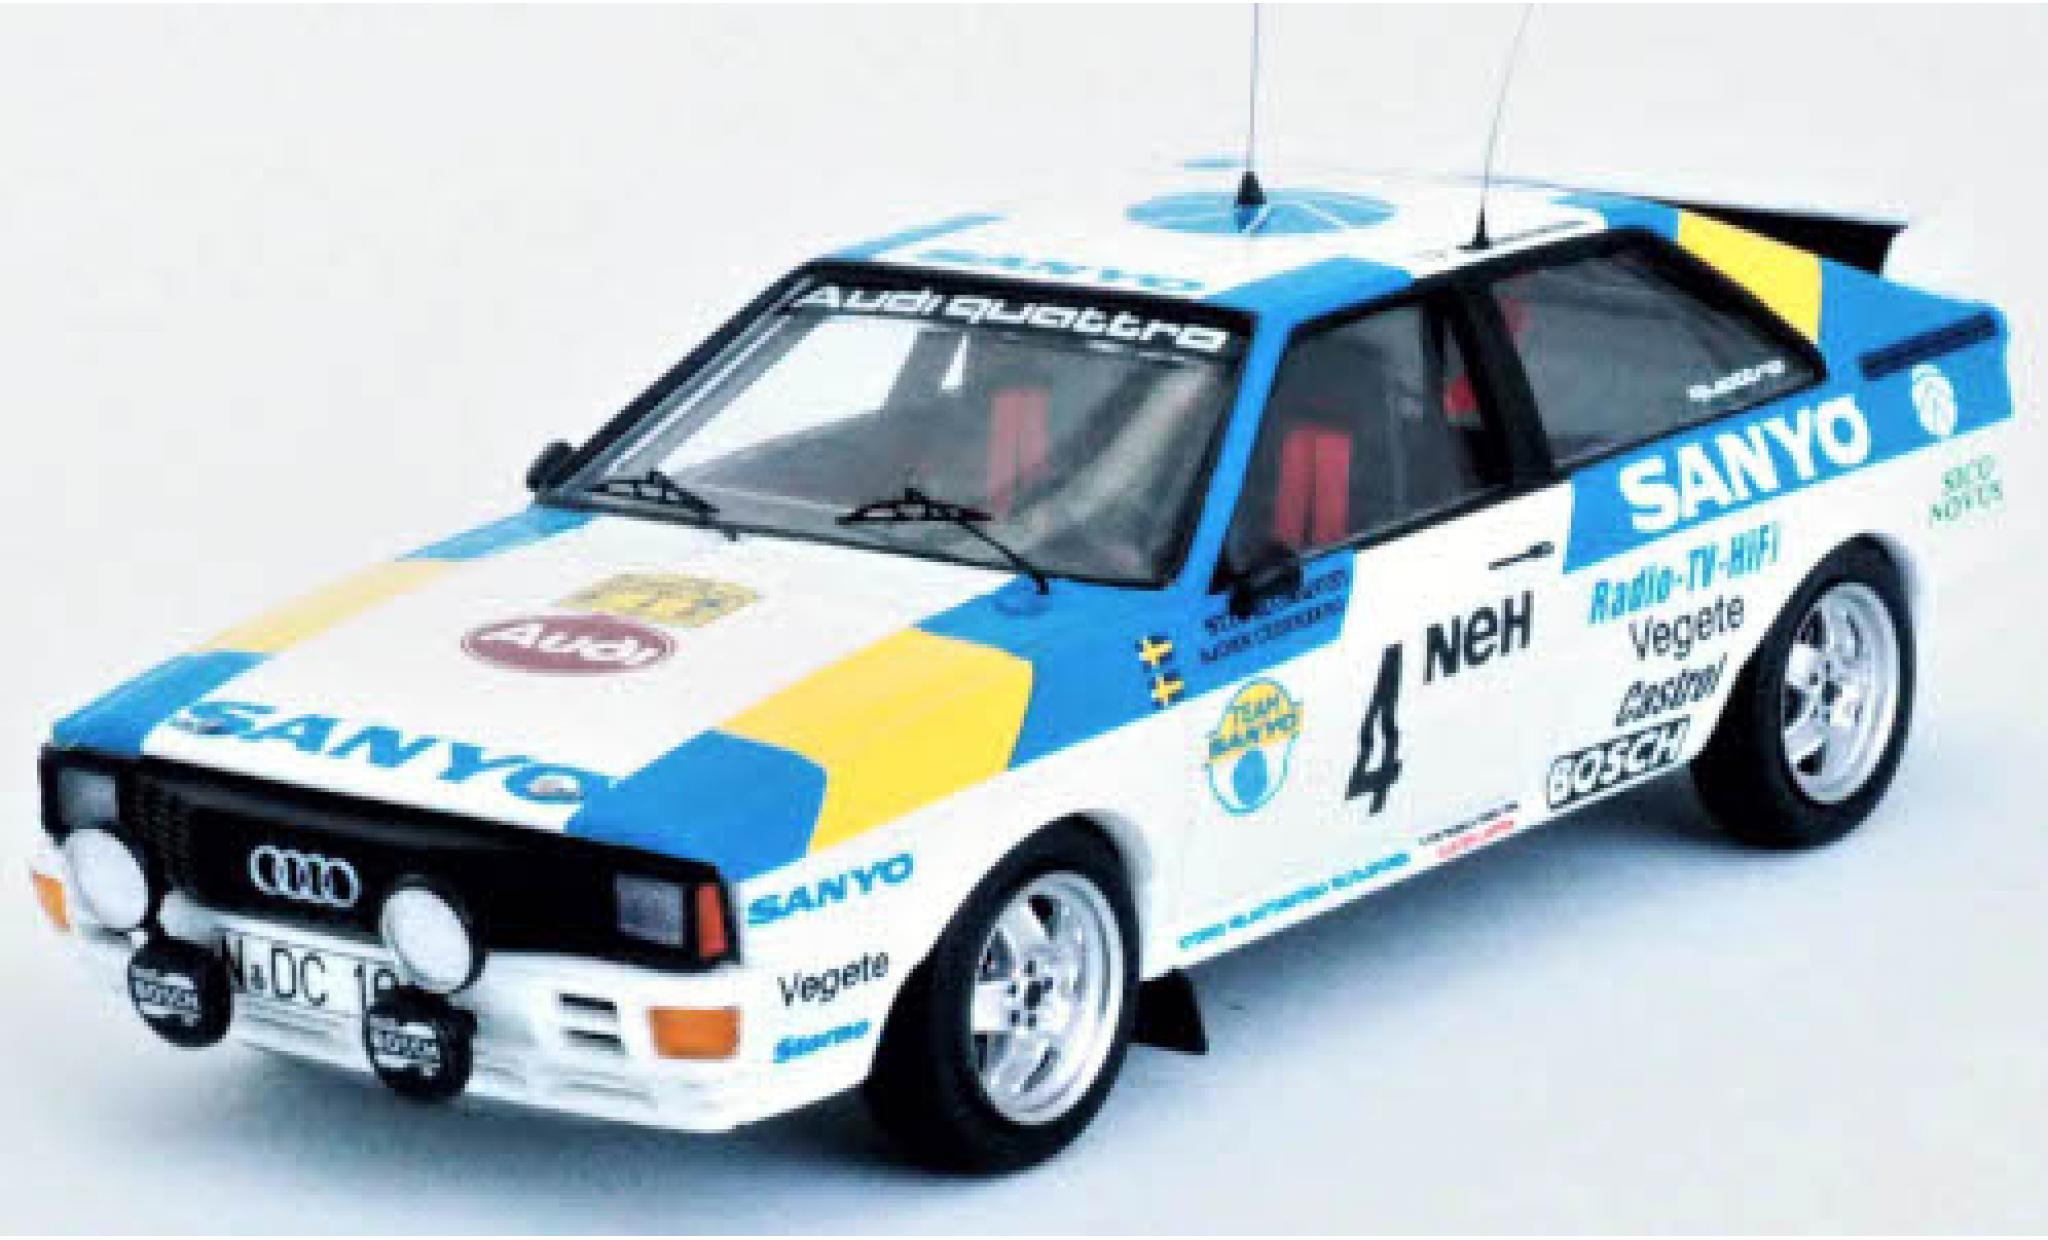 Audi Quattro 1/43 Trofeu quattro No.4 Sanyo Rallye WM Rallye Schweden 1982 S.Blomqvist/B.Cederberg